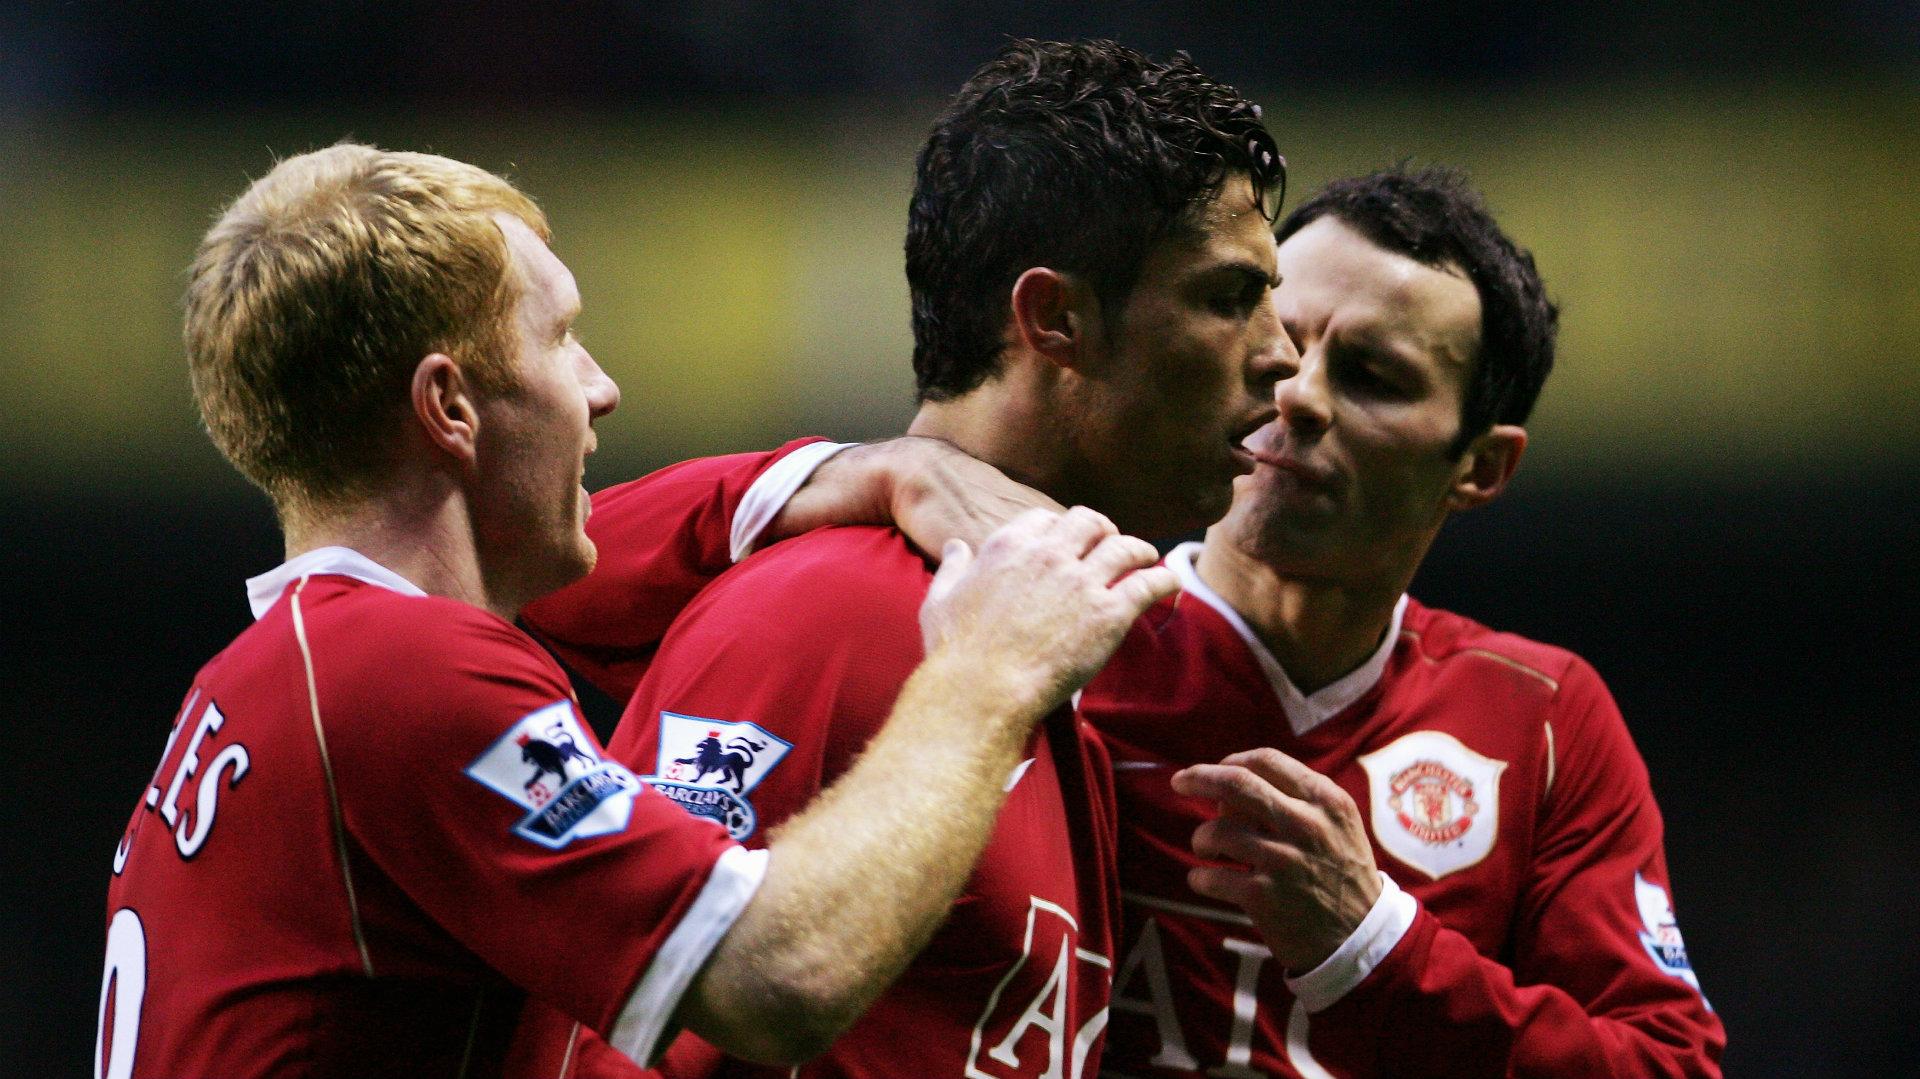 Ronaldo and Scholes make Solskjaer's dream six-a-side team of Manchester United legends